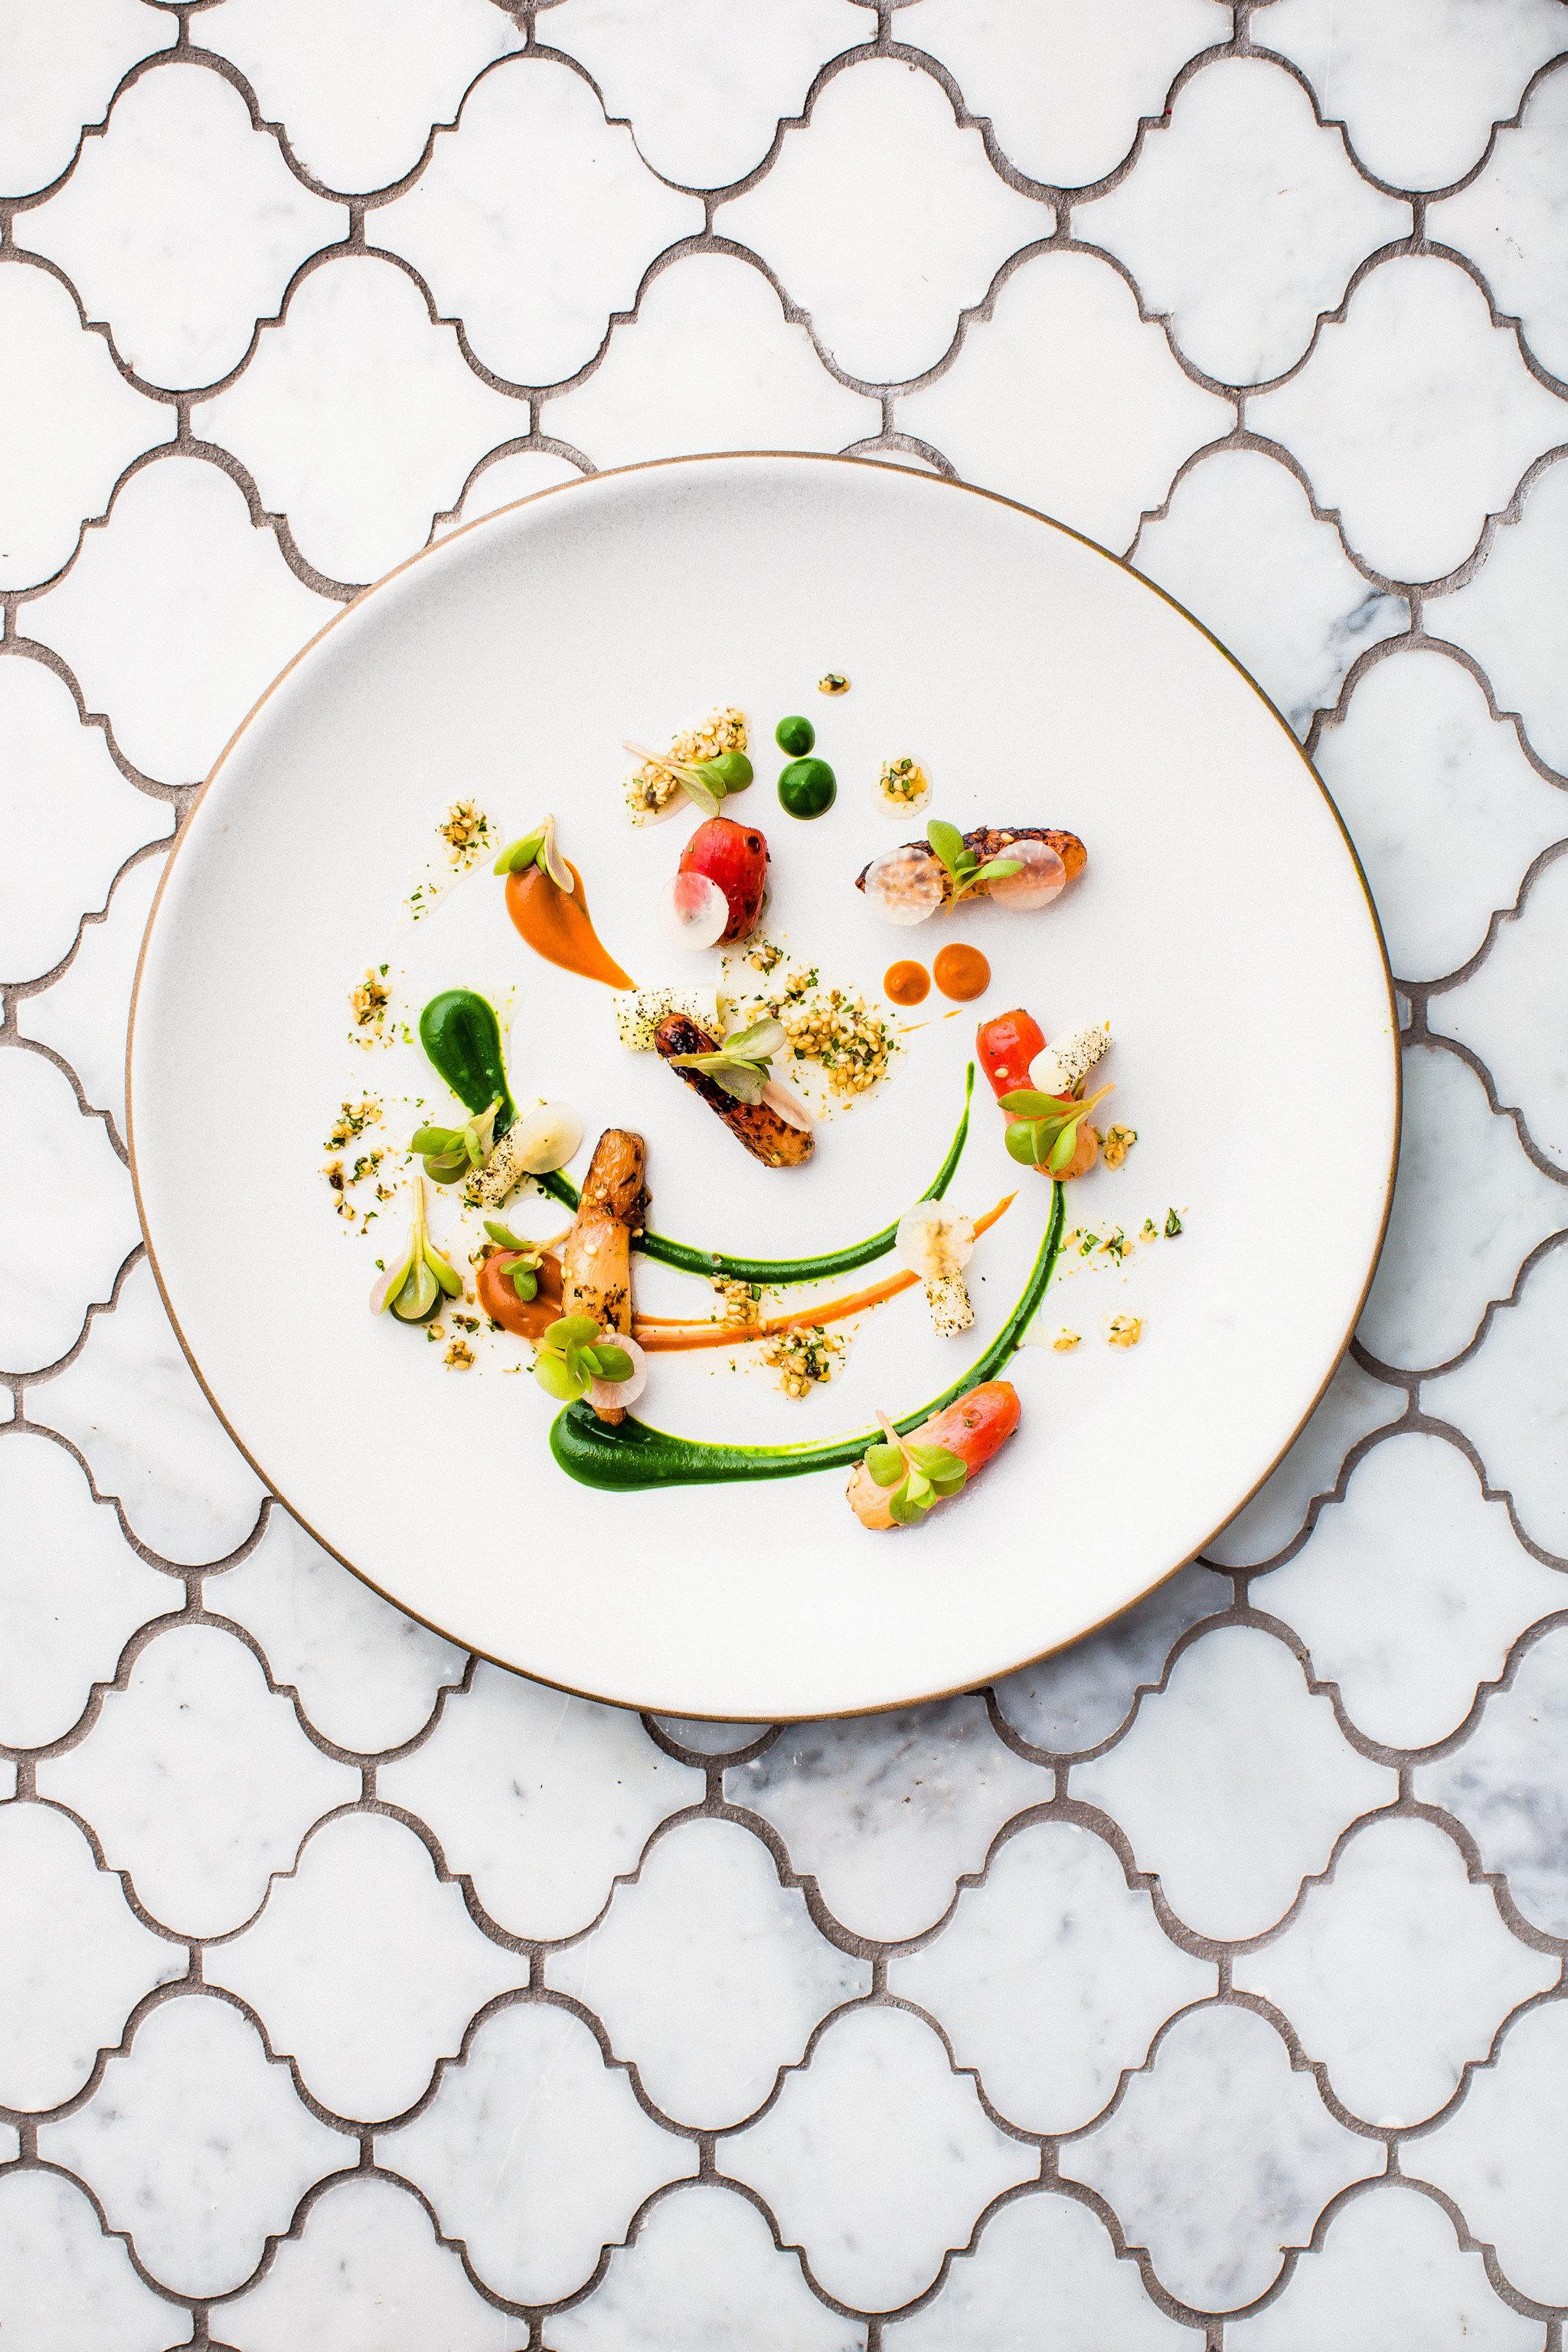 Food + Drink Trip Ideas dishware plate dish tableware food serveware platter porcelain recipe